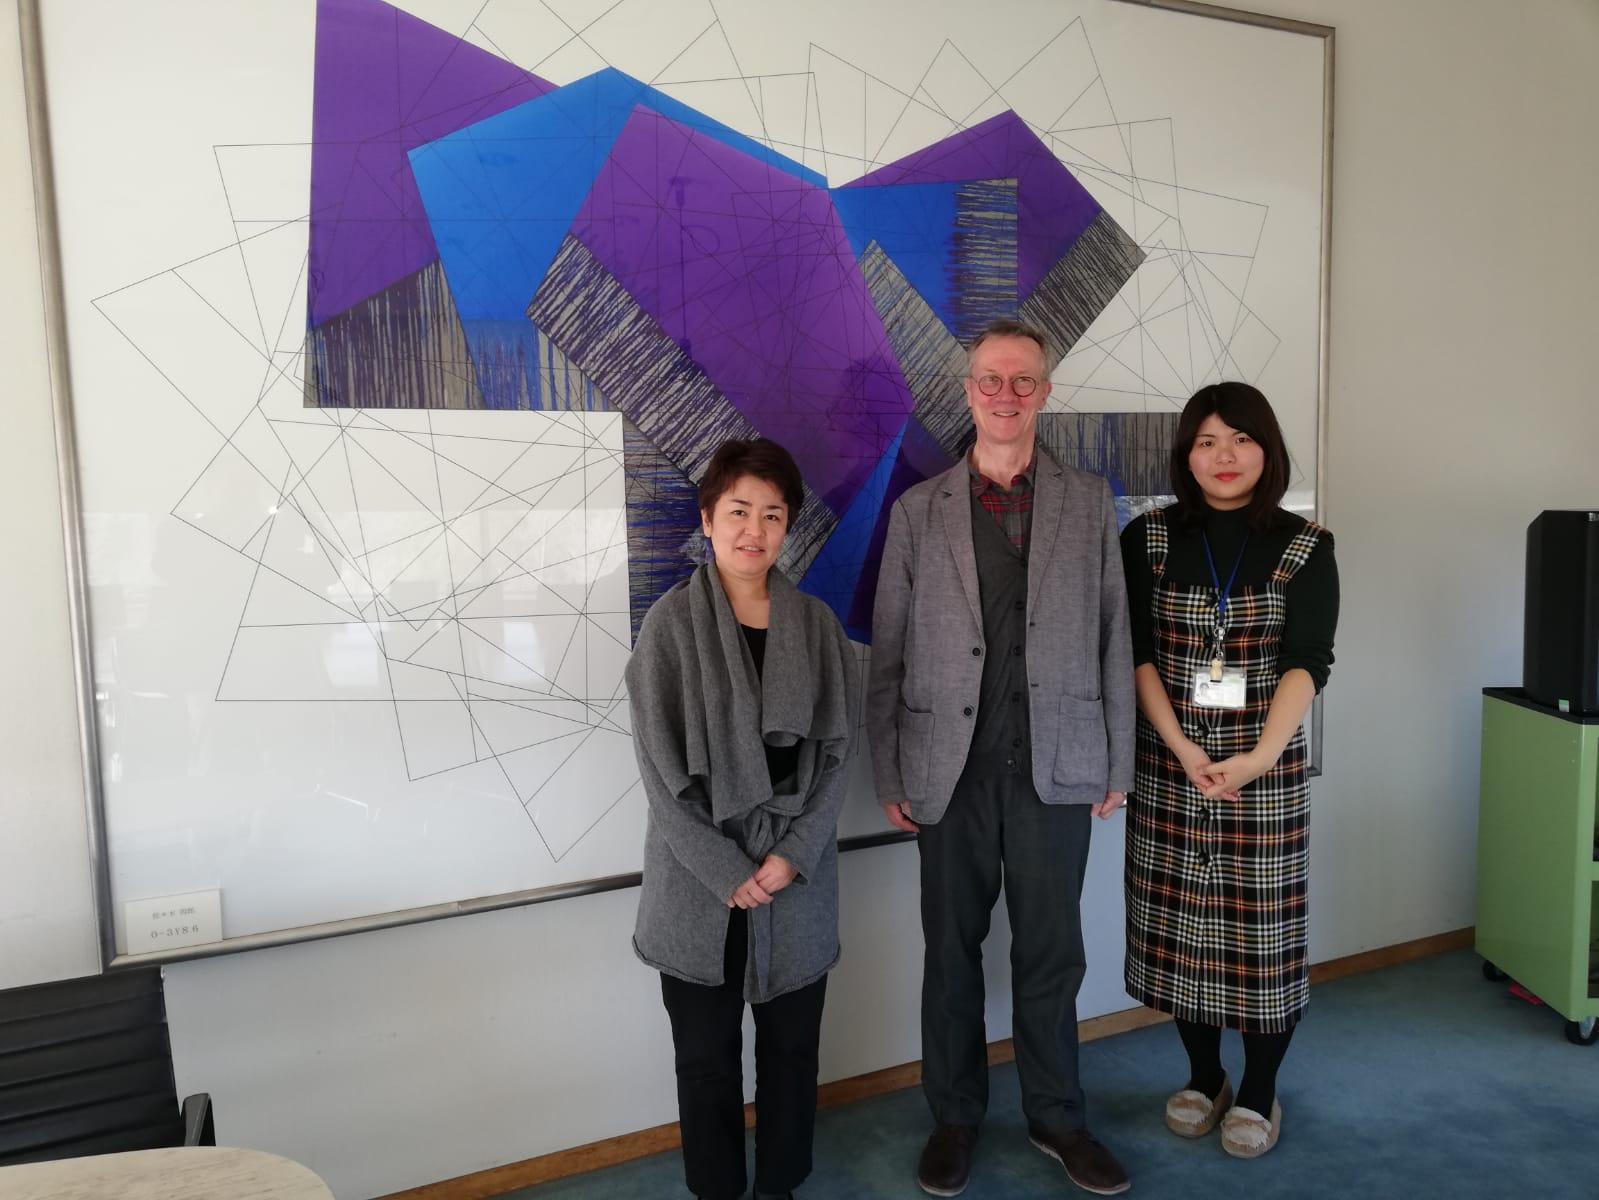 Meeting the curators at Kawasaki City Museum